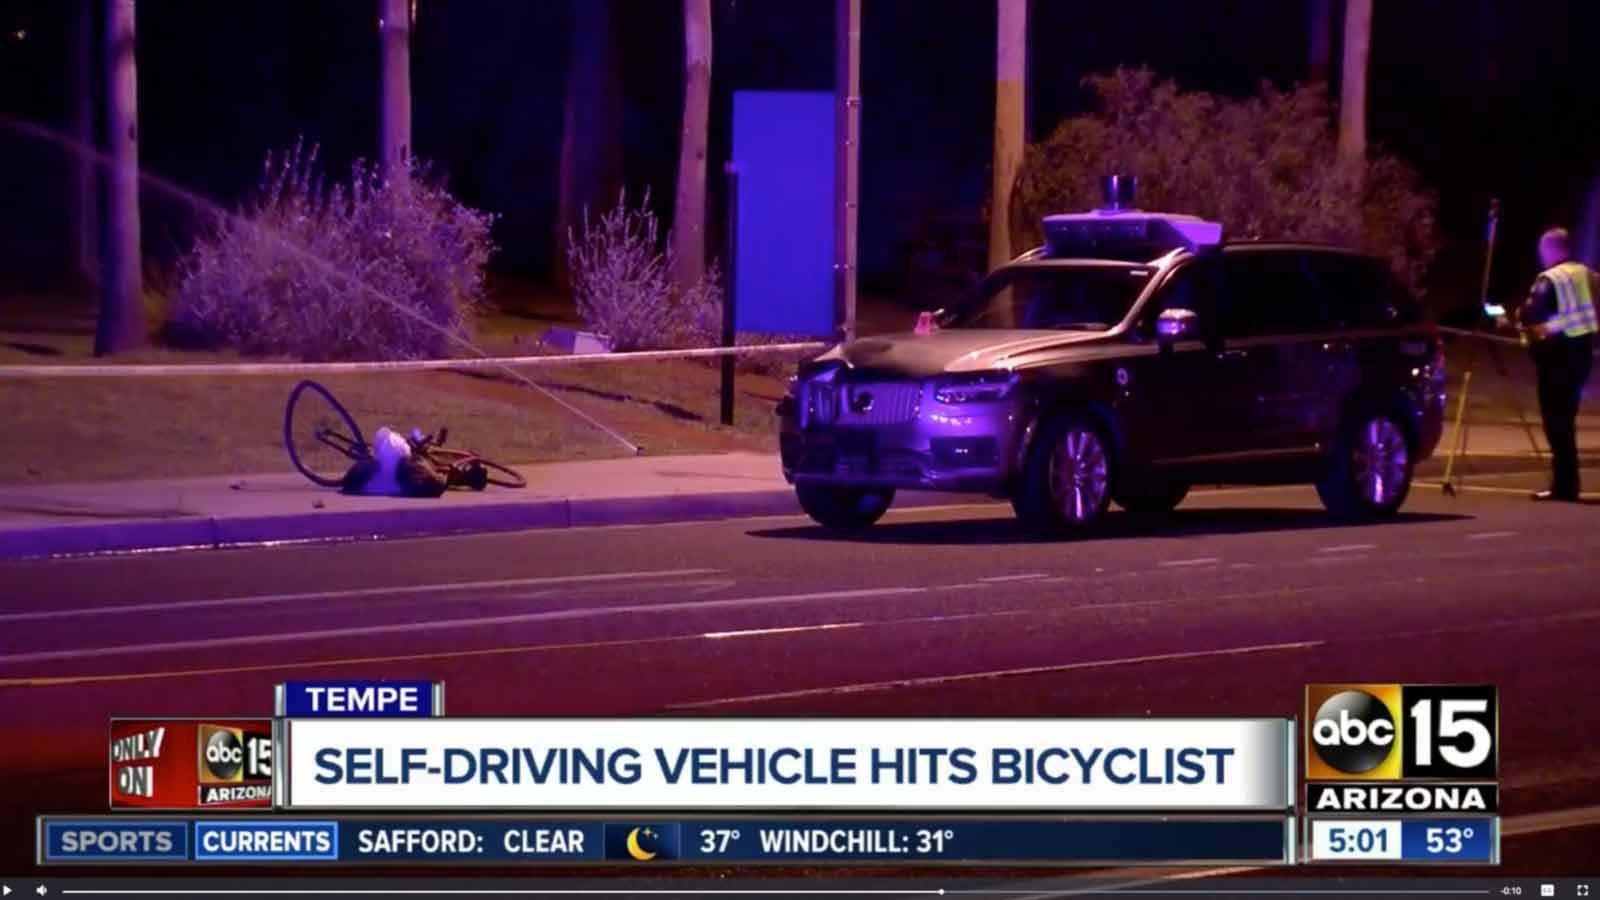 Volvo Uber Suv Kills Bicyclist